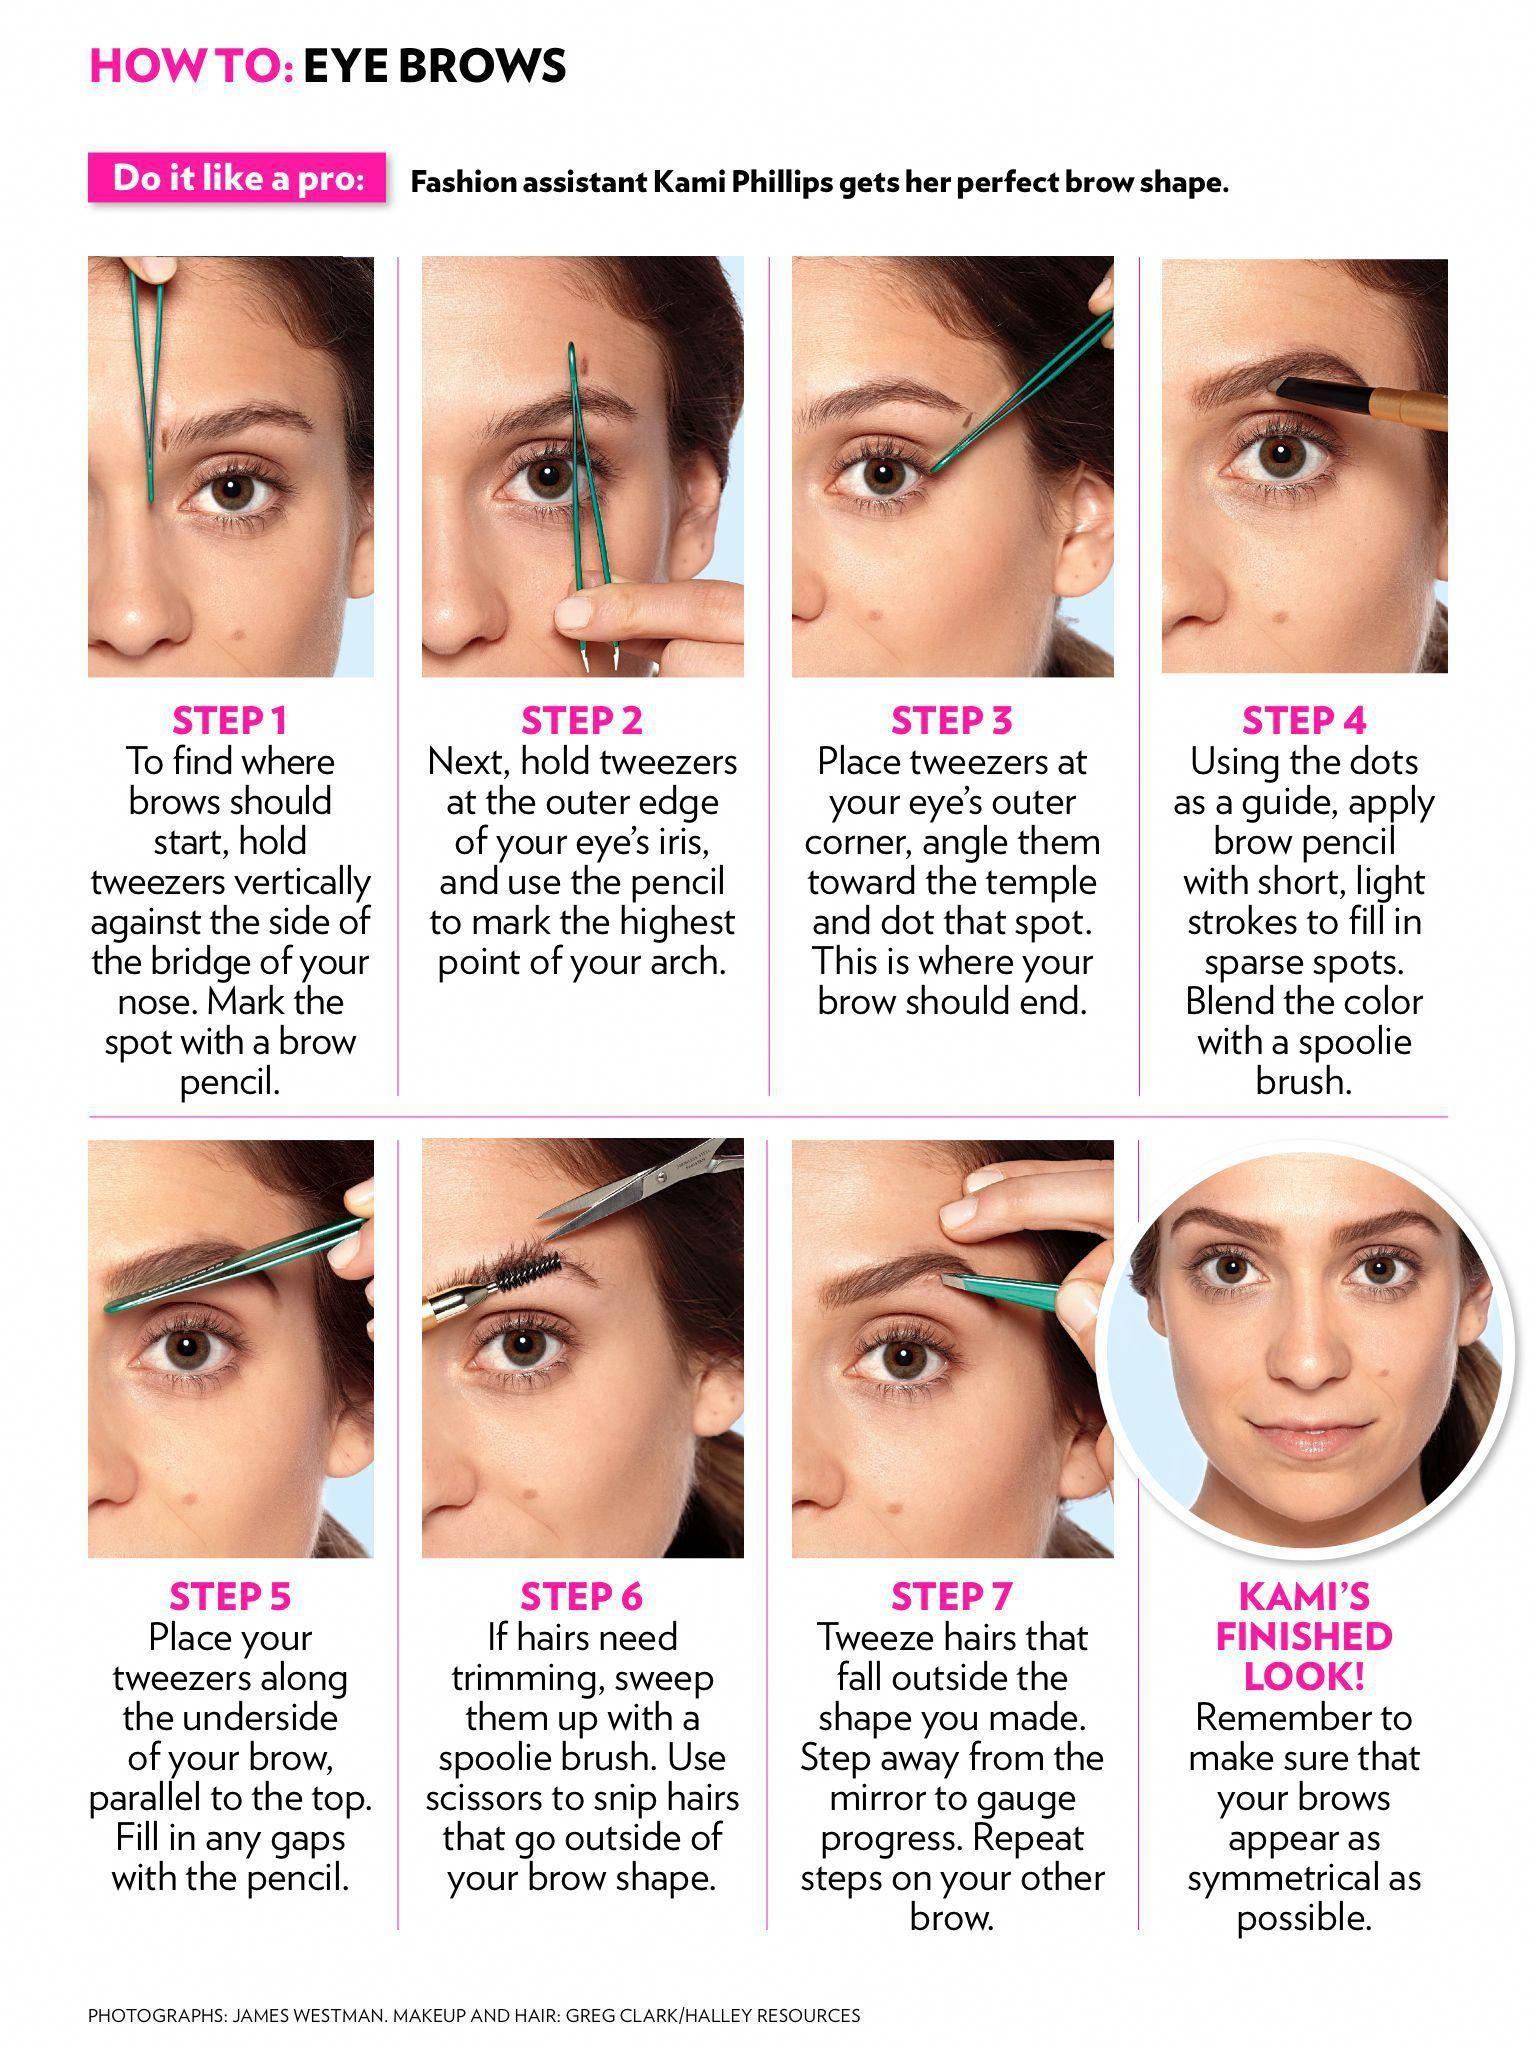 Eyebrow Styles   Threading Your Eyebrows   Eyebrowz ...